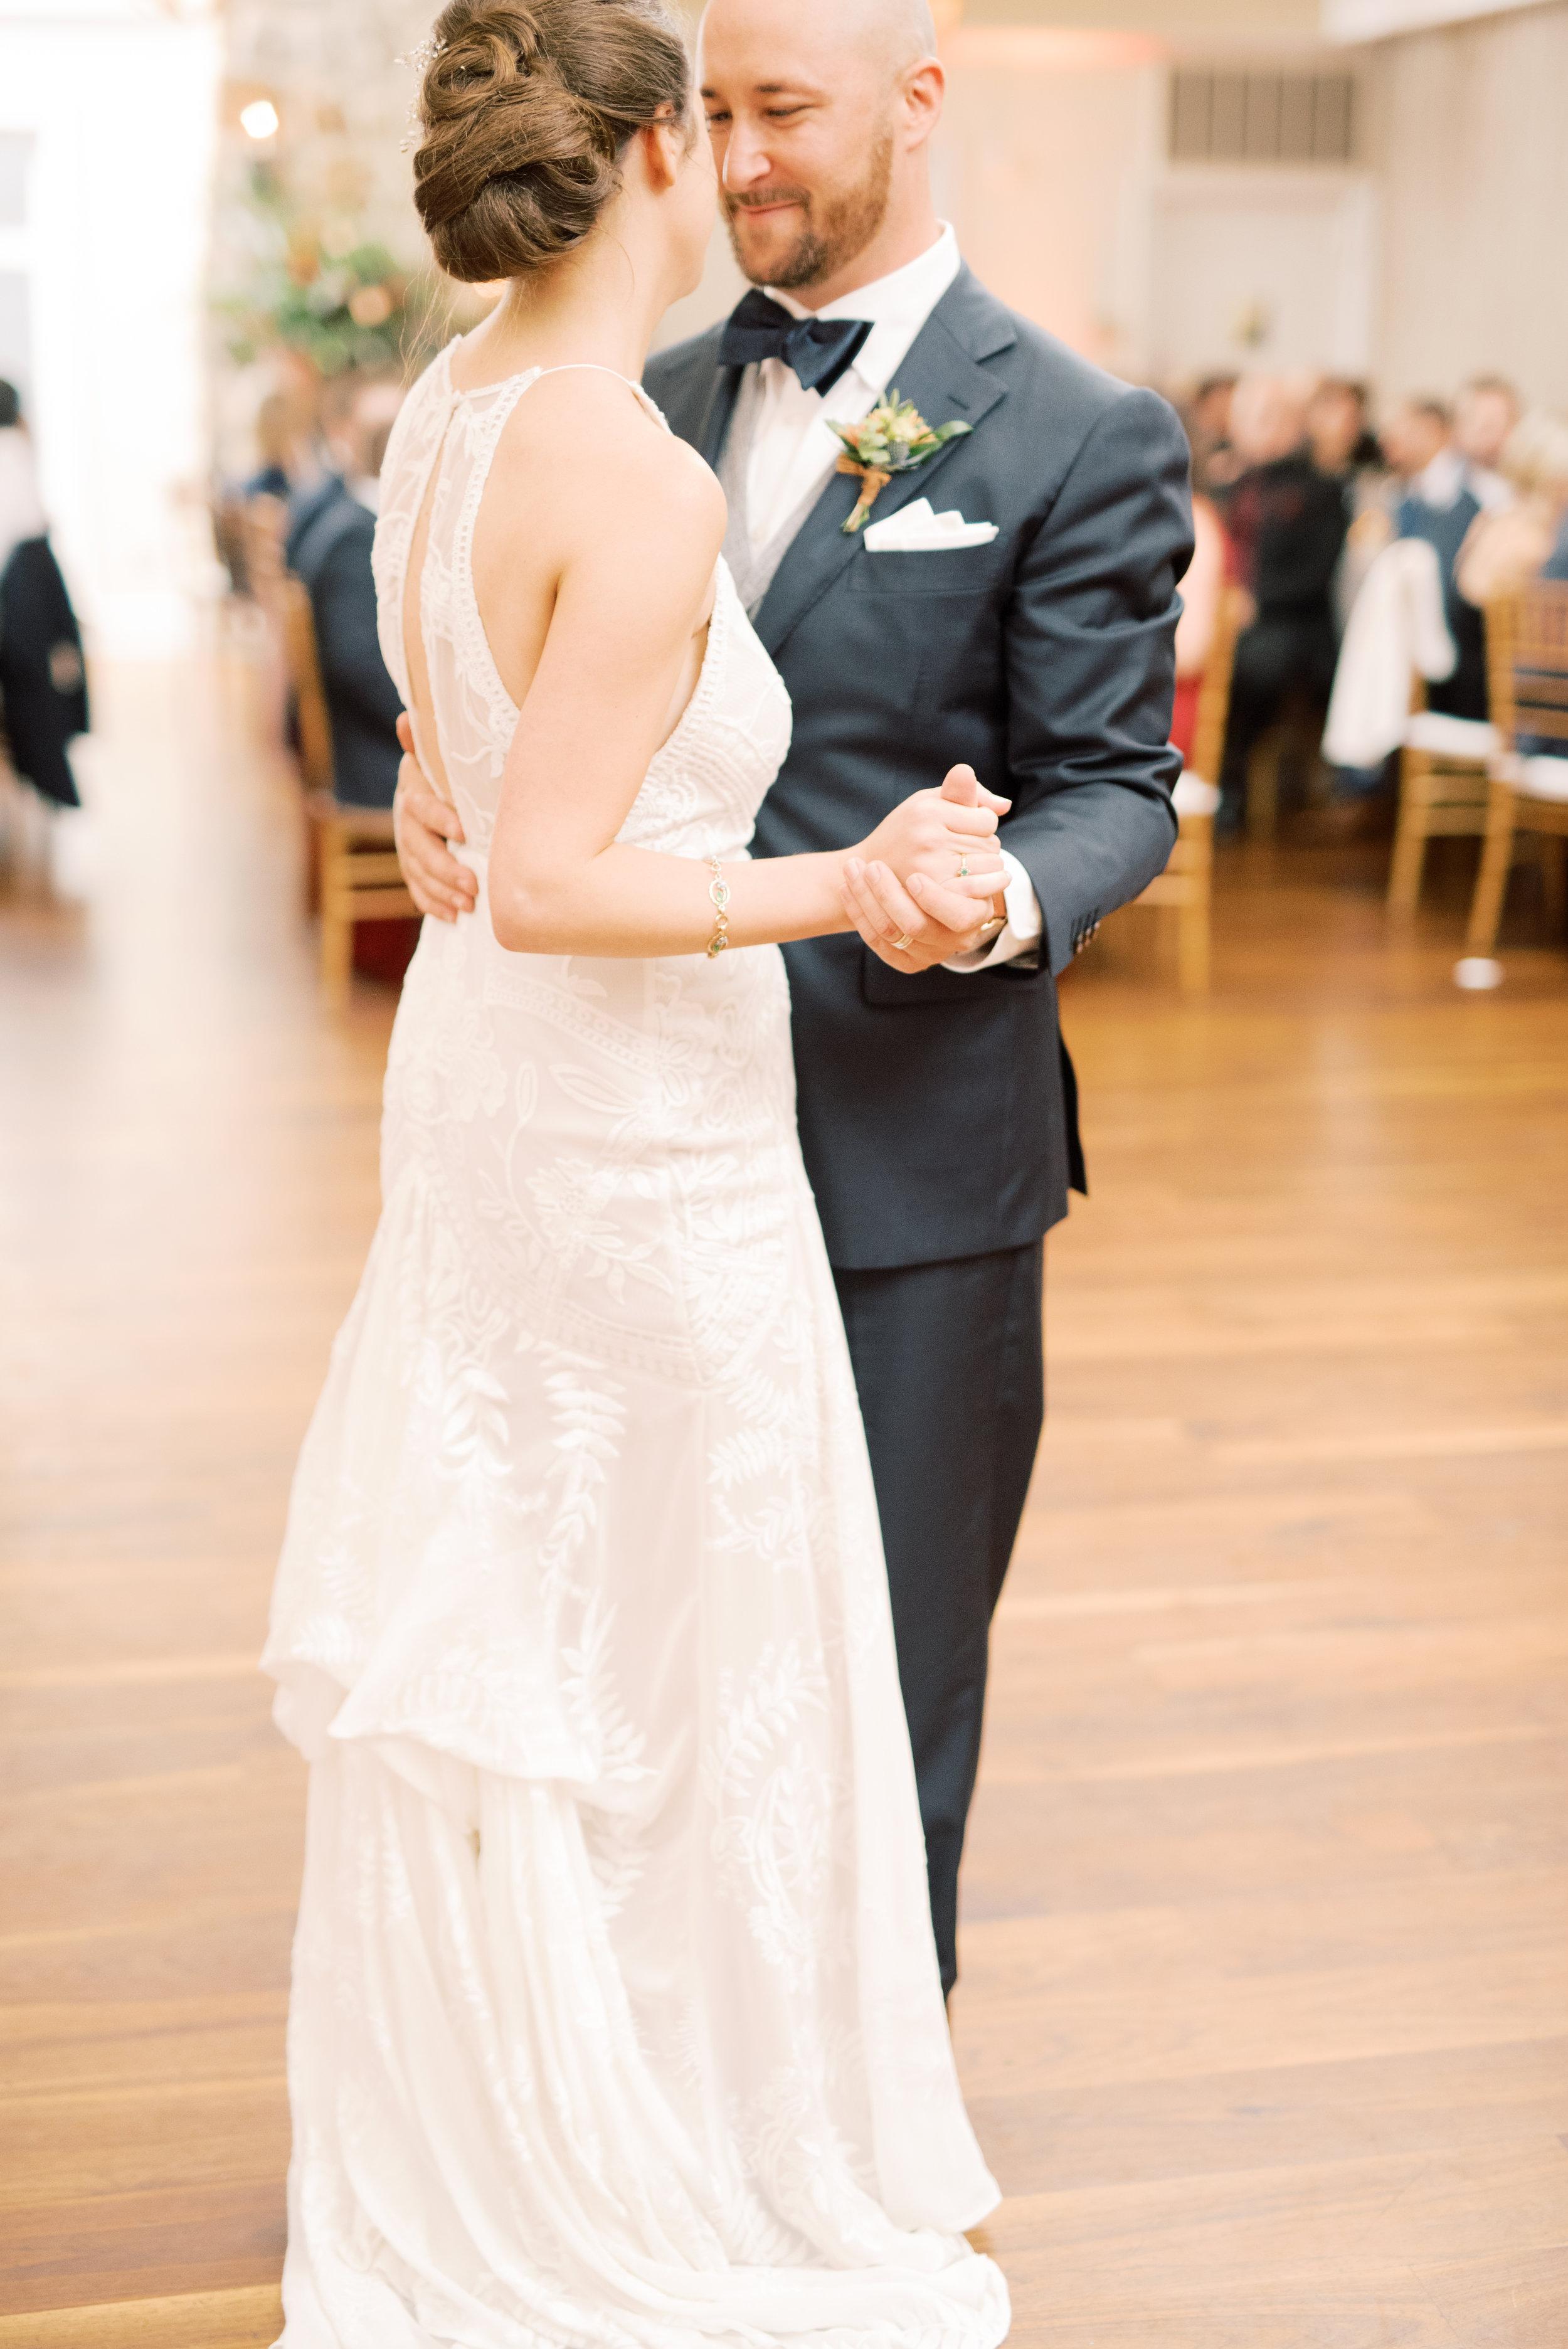 haley-richter-photography-october-pomme-wedding-in-radnor-105.jpg